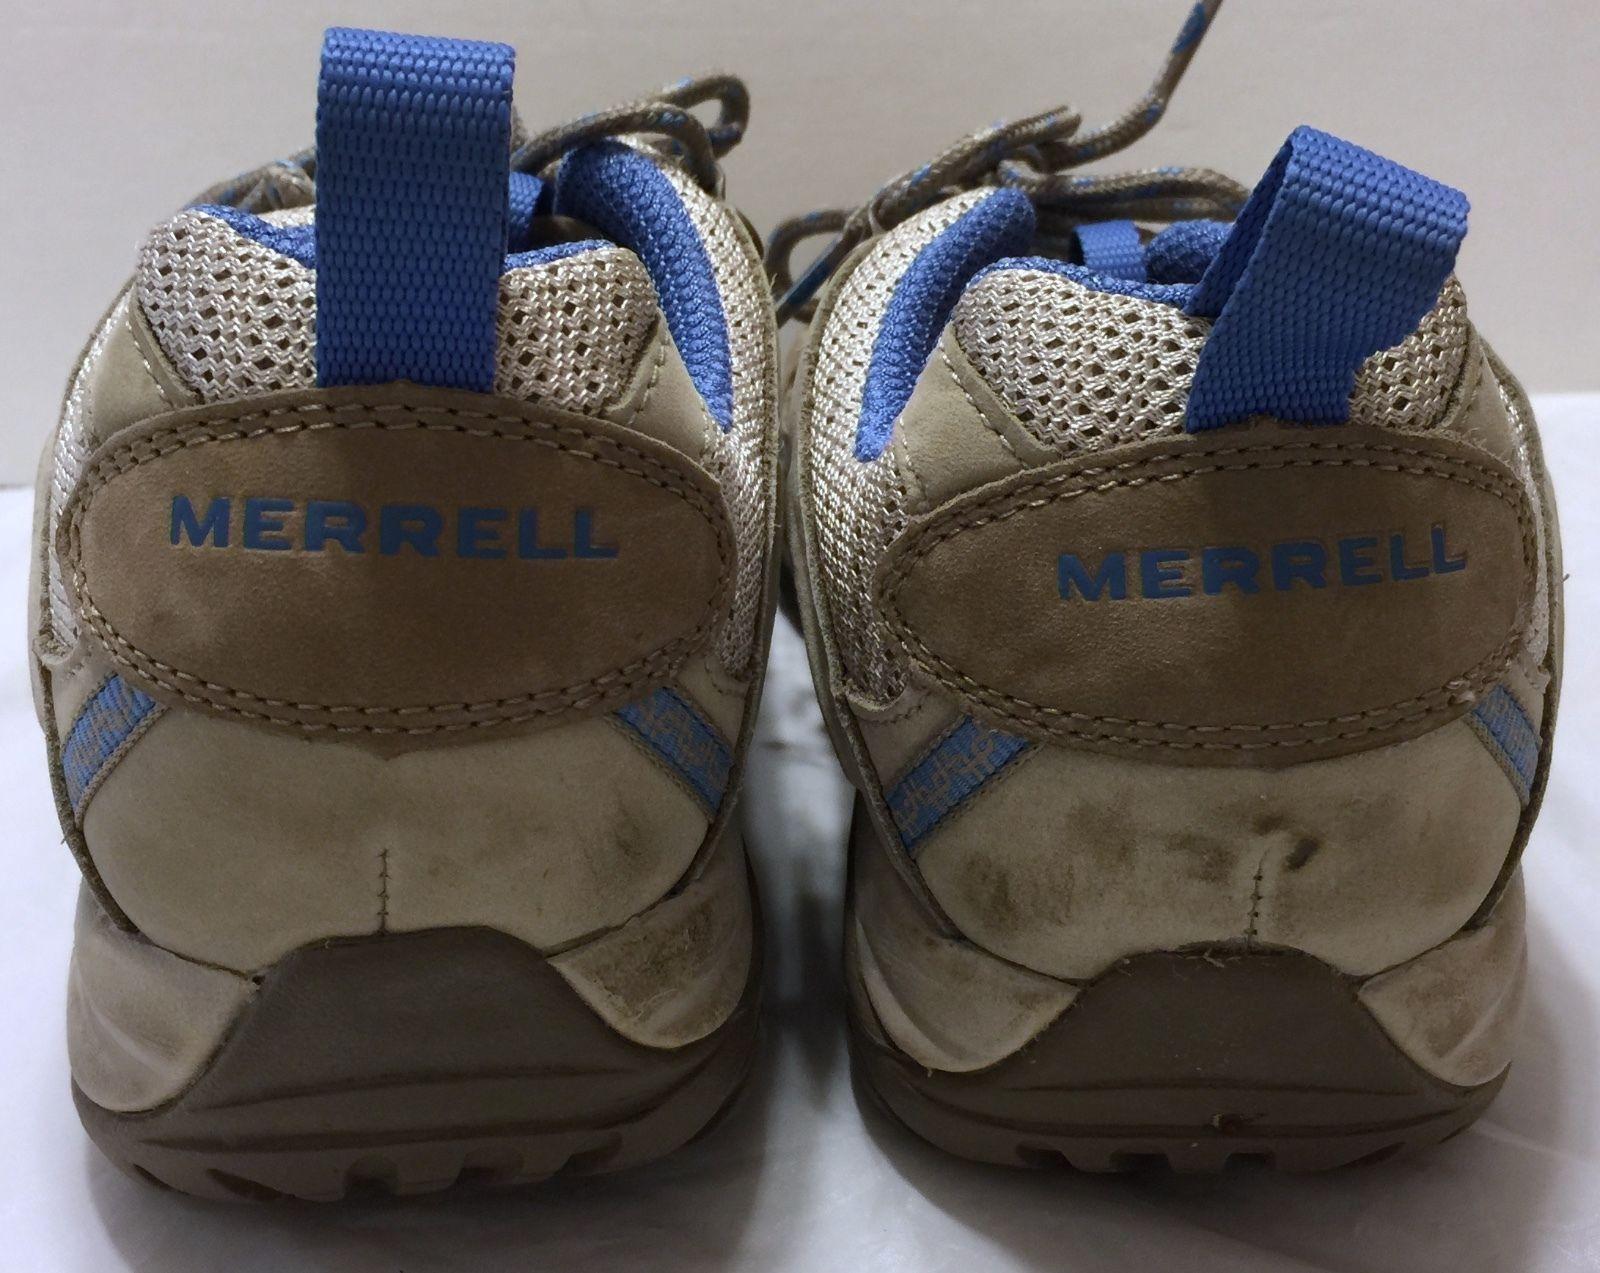 Merrell Siren Sport Aluminum Washed Denim Hiking Shoes Size 7.5 Vibram Soles